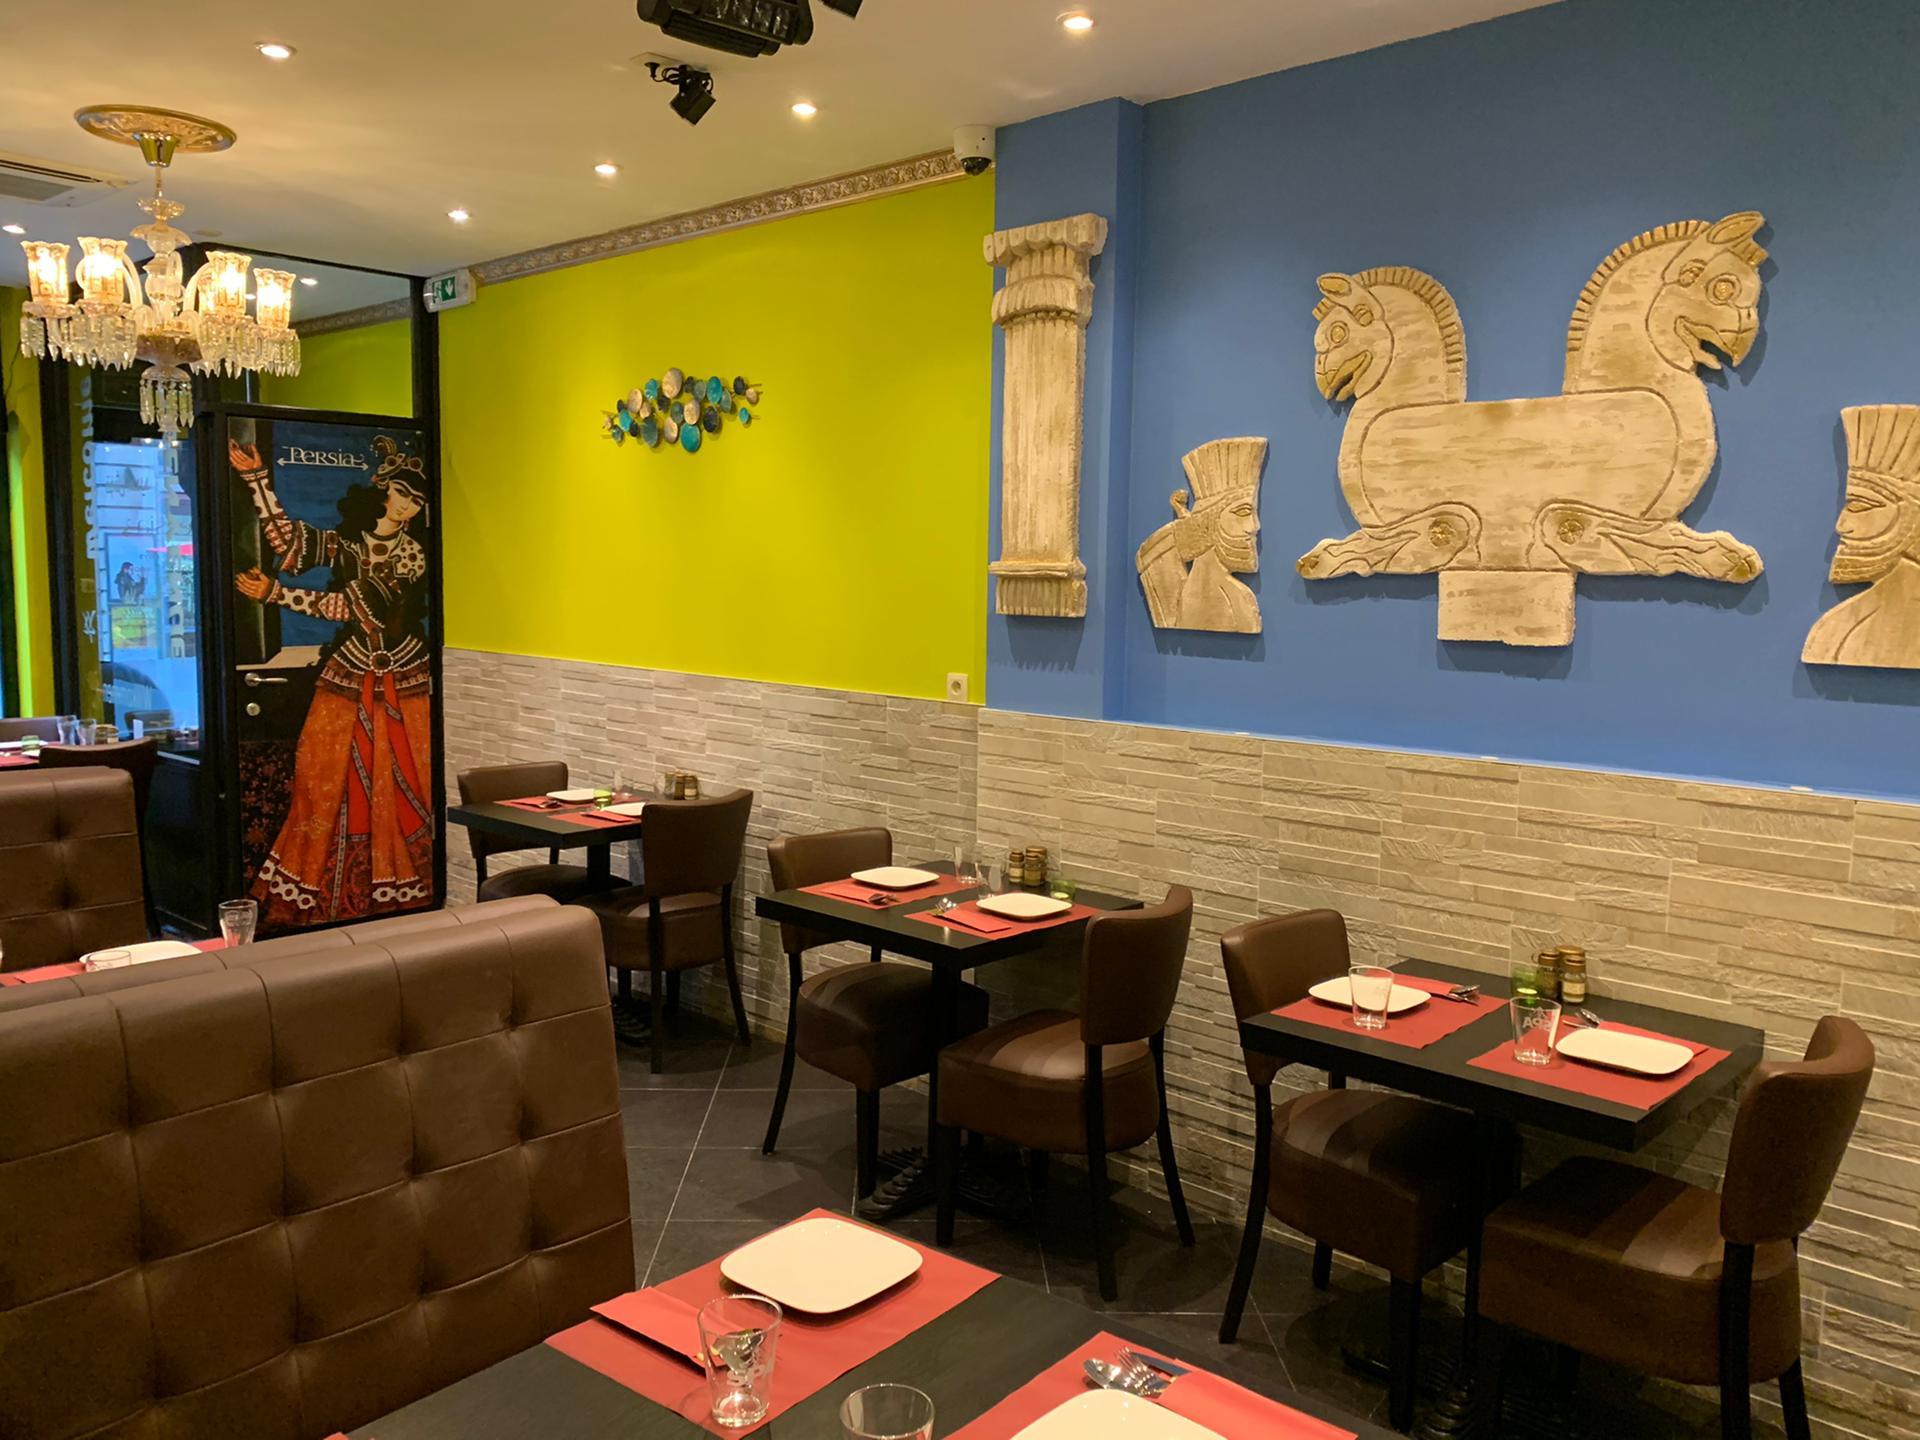 Cuisine Iranian a Brussels رستوران ایرانی در بروکسل Iranian Restaurant in Brussels